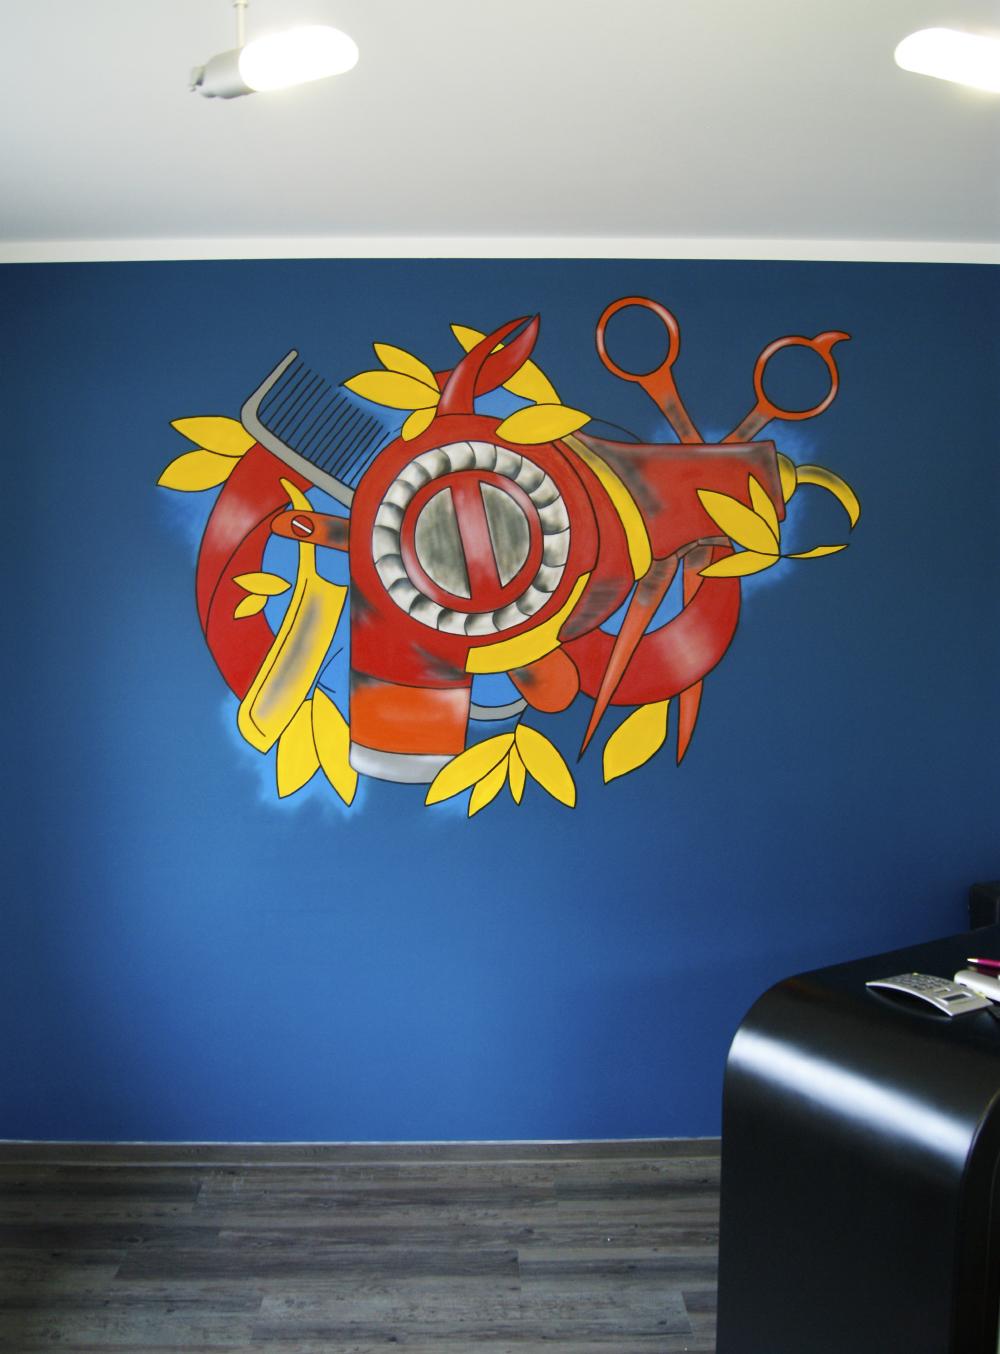 Wandgestaltung - Friseur Salon - Graffiti Auftrag